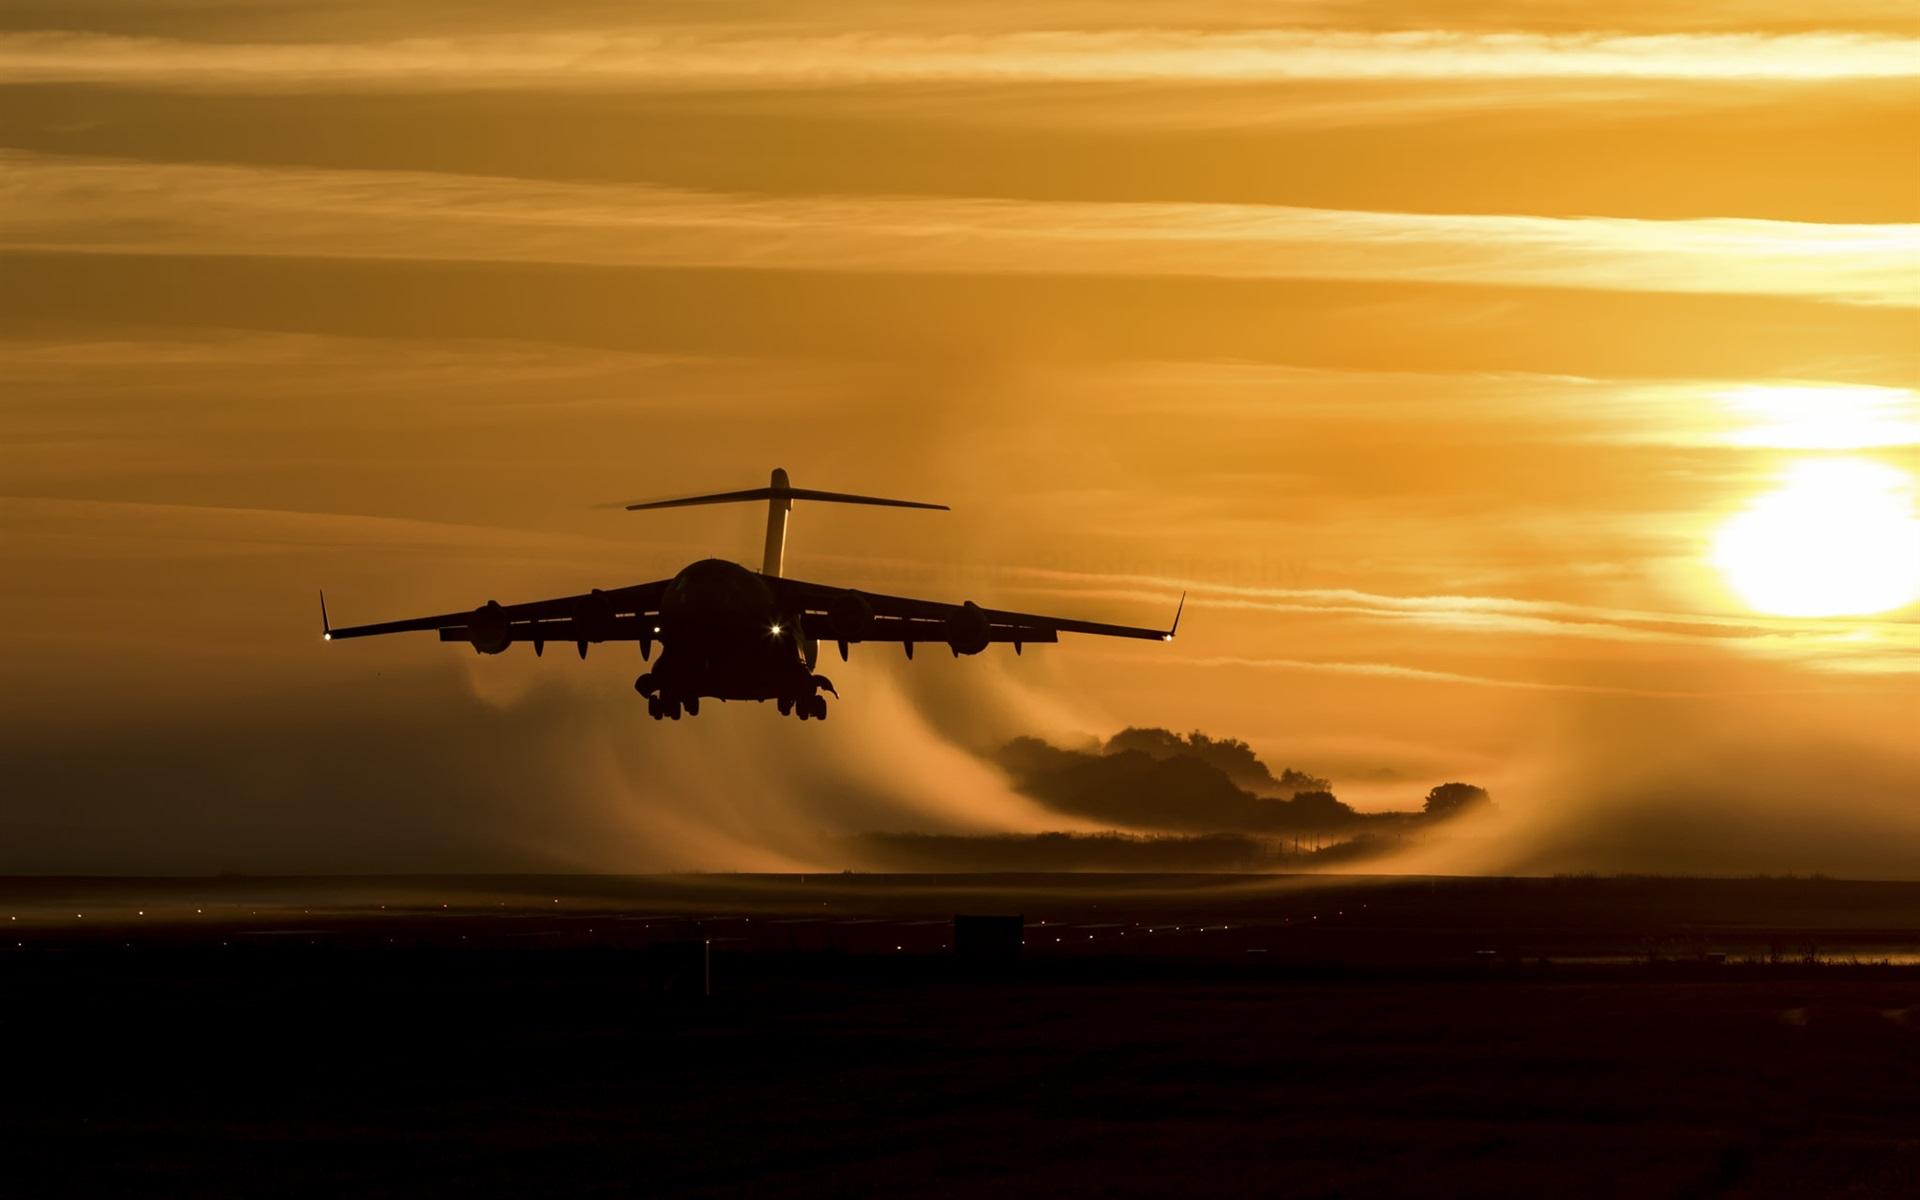 Wallpaper Plane Landing Sunset 1920x1200 Hd Picture Image